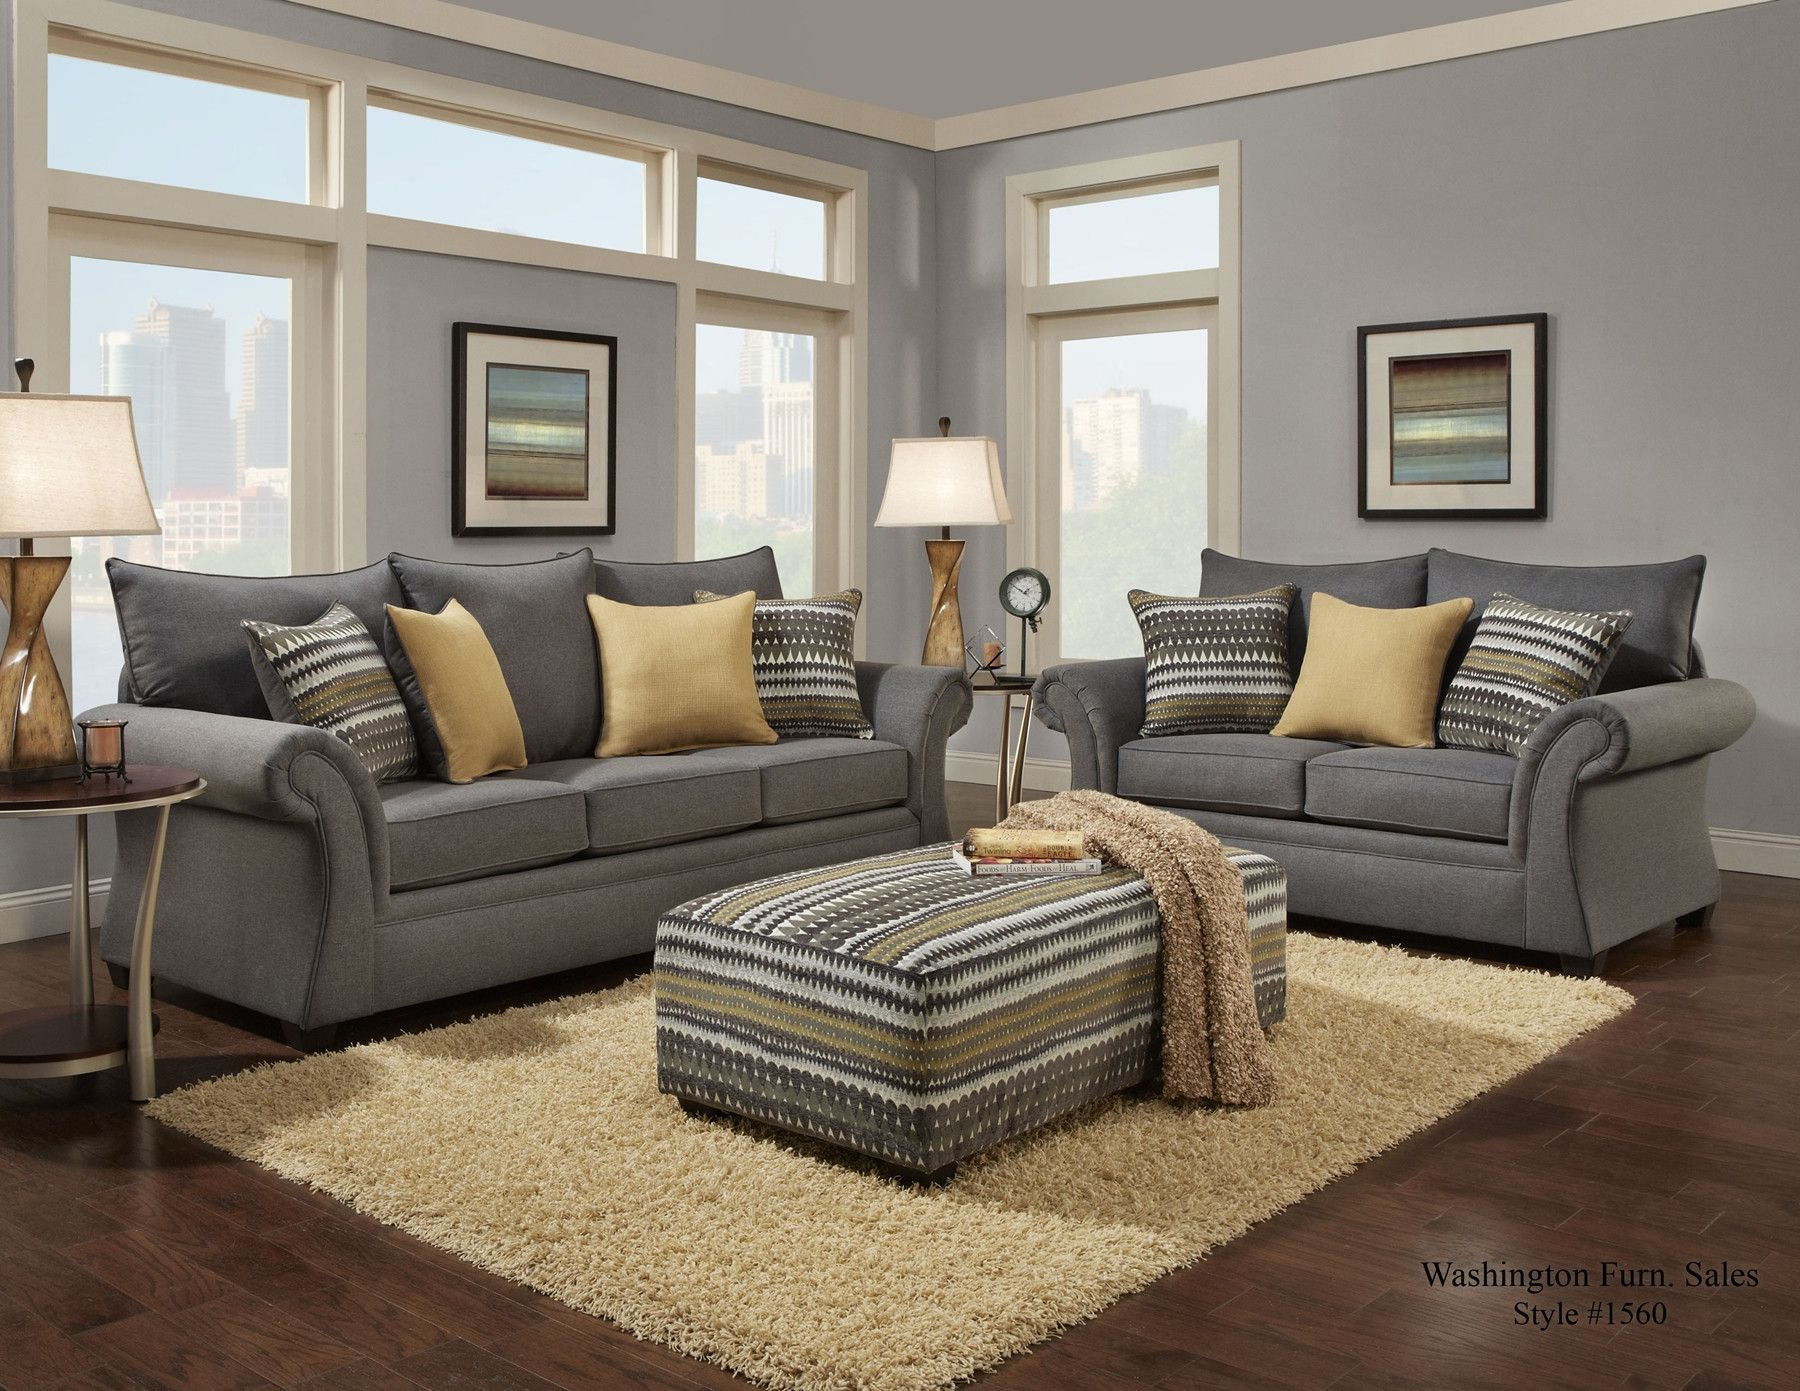 1560 Jitterbug Gray Sofa U0026 Loveseat By Washington Furniture. Get Your 1560  Jitterbug Gray Sofa U0026 Loveseat At Railway Freight Furniture, Albany GA  Furniture ...